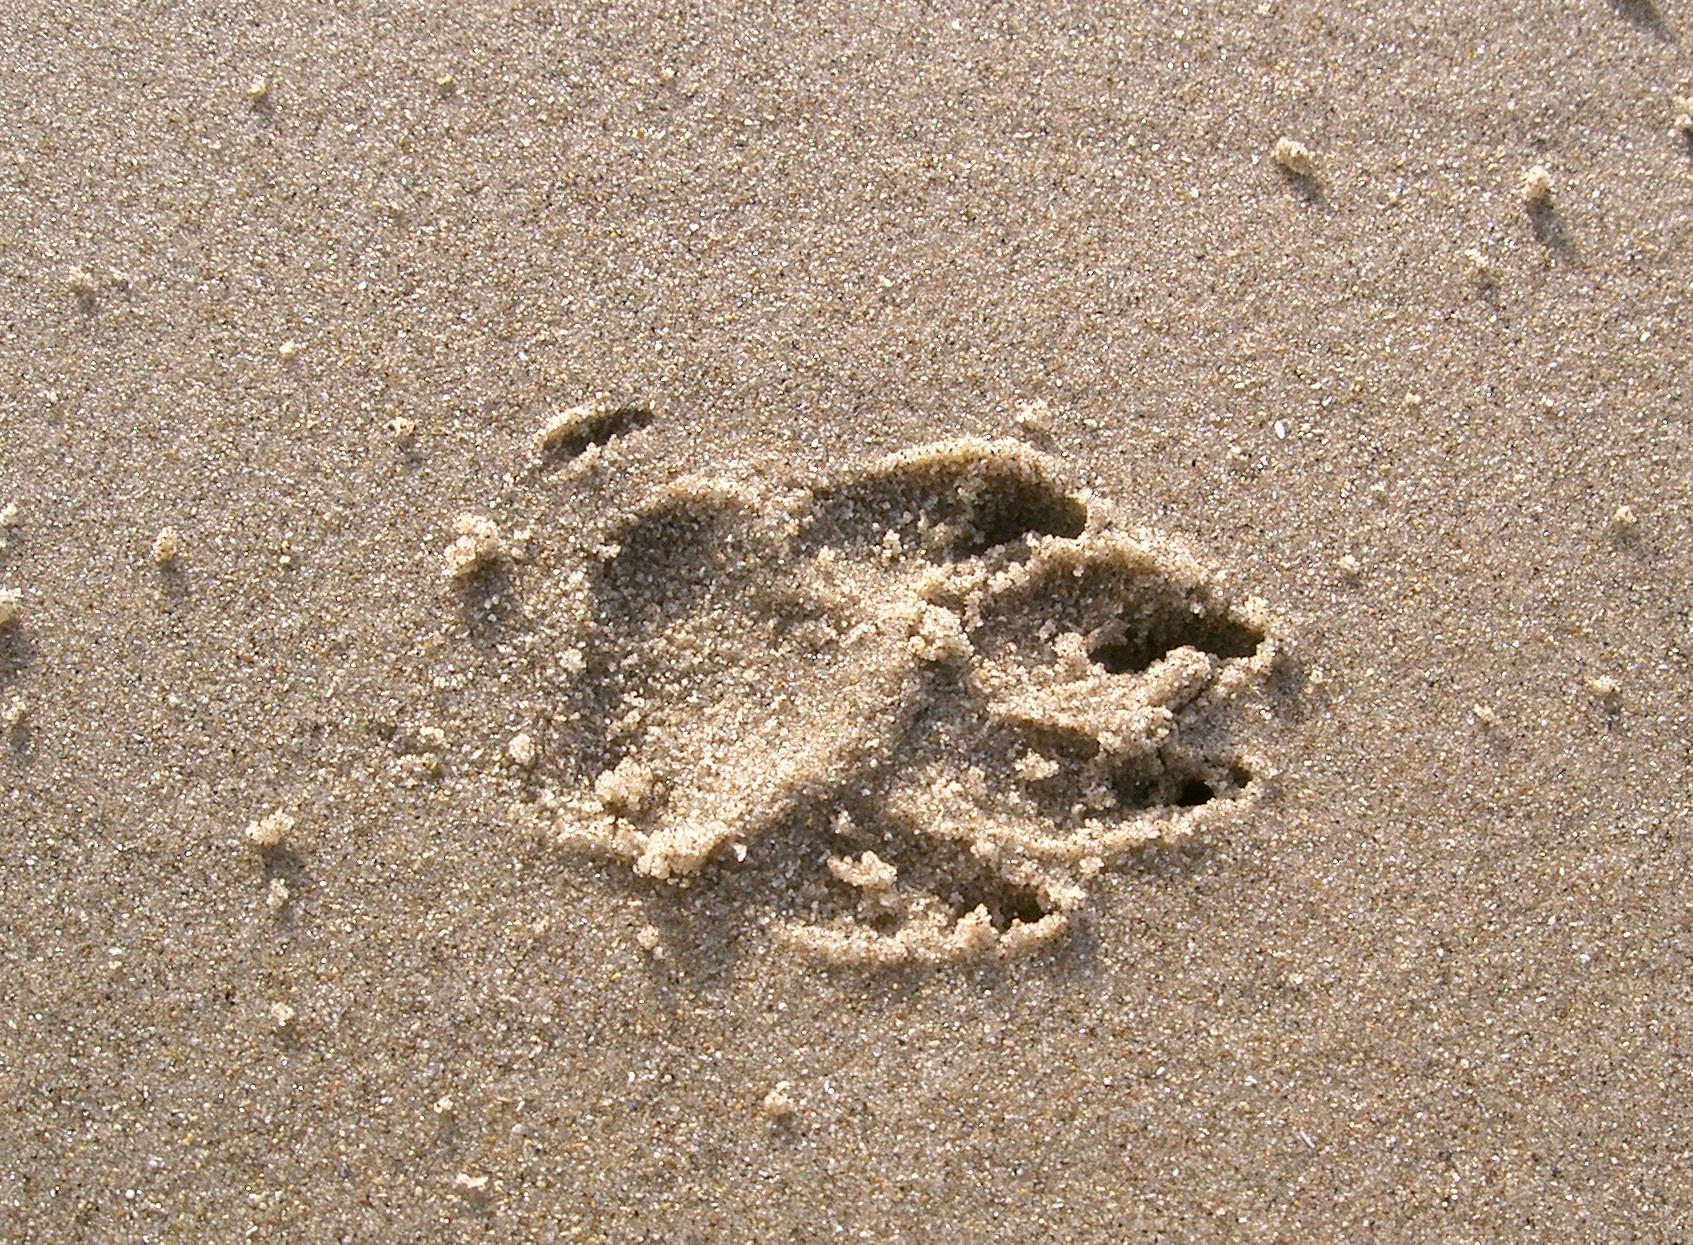 footprint 02: dog in sand